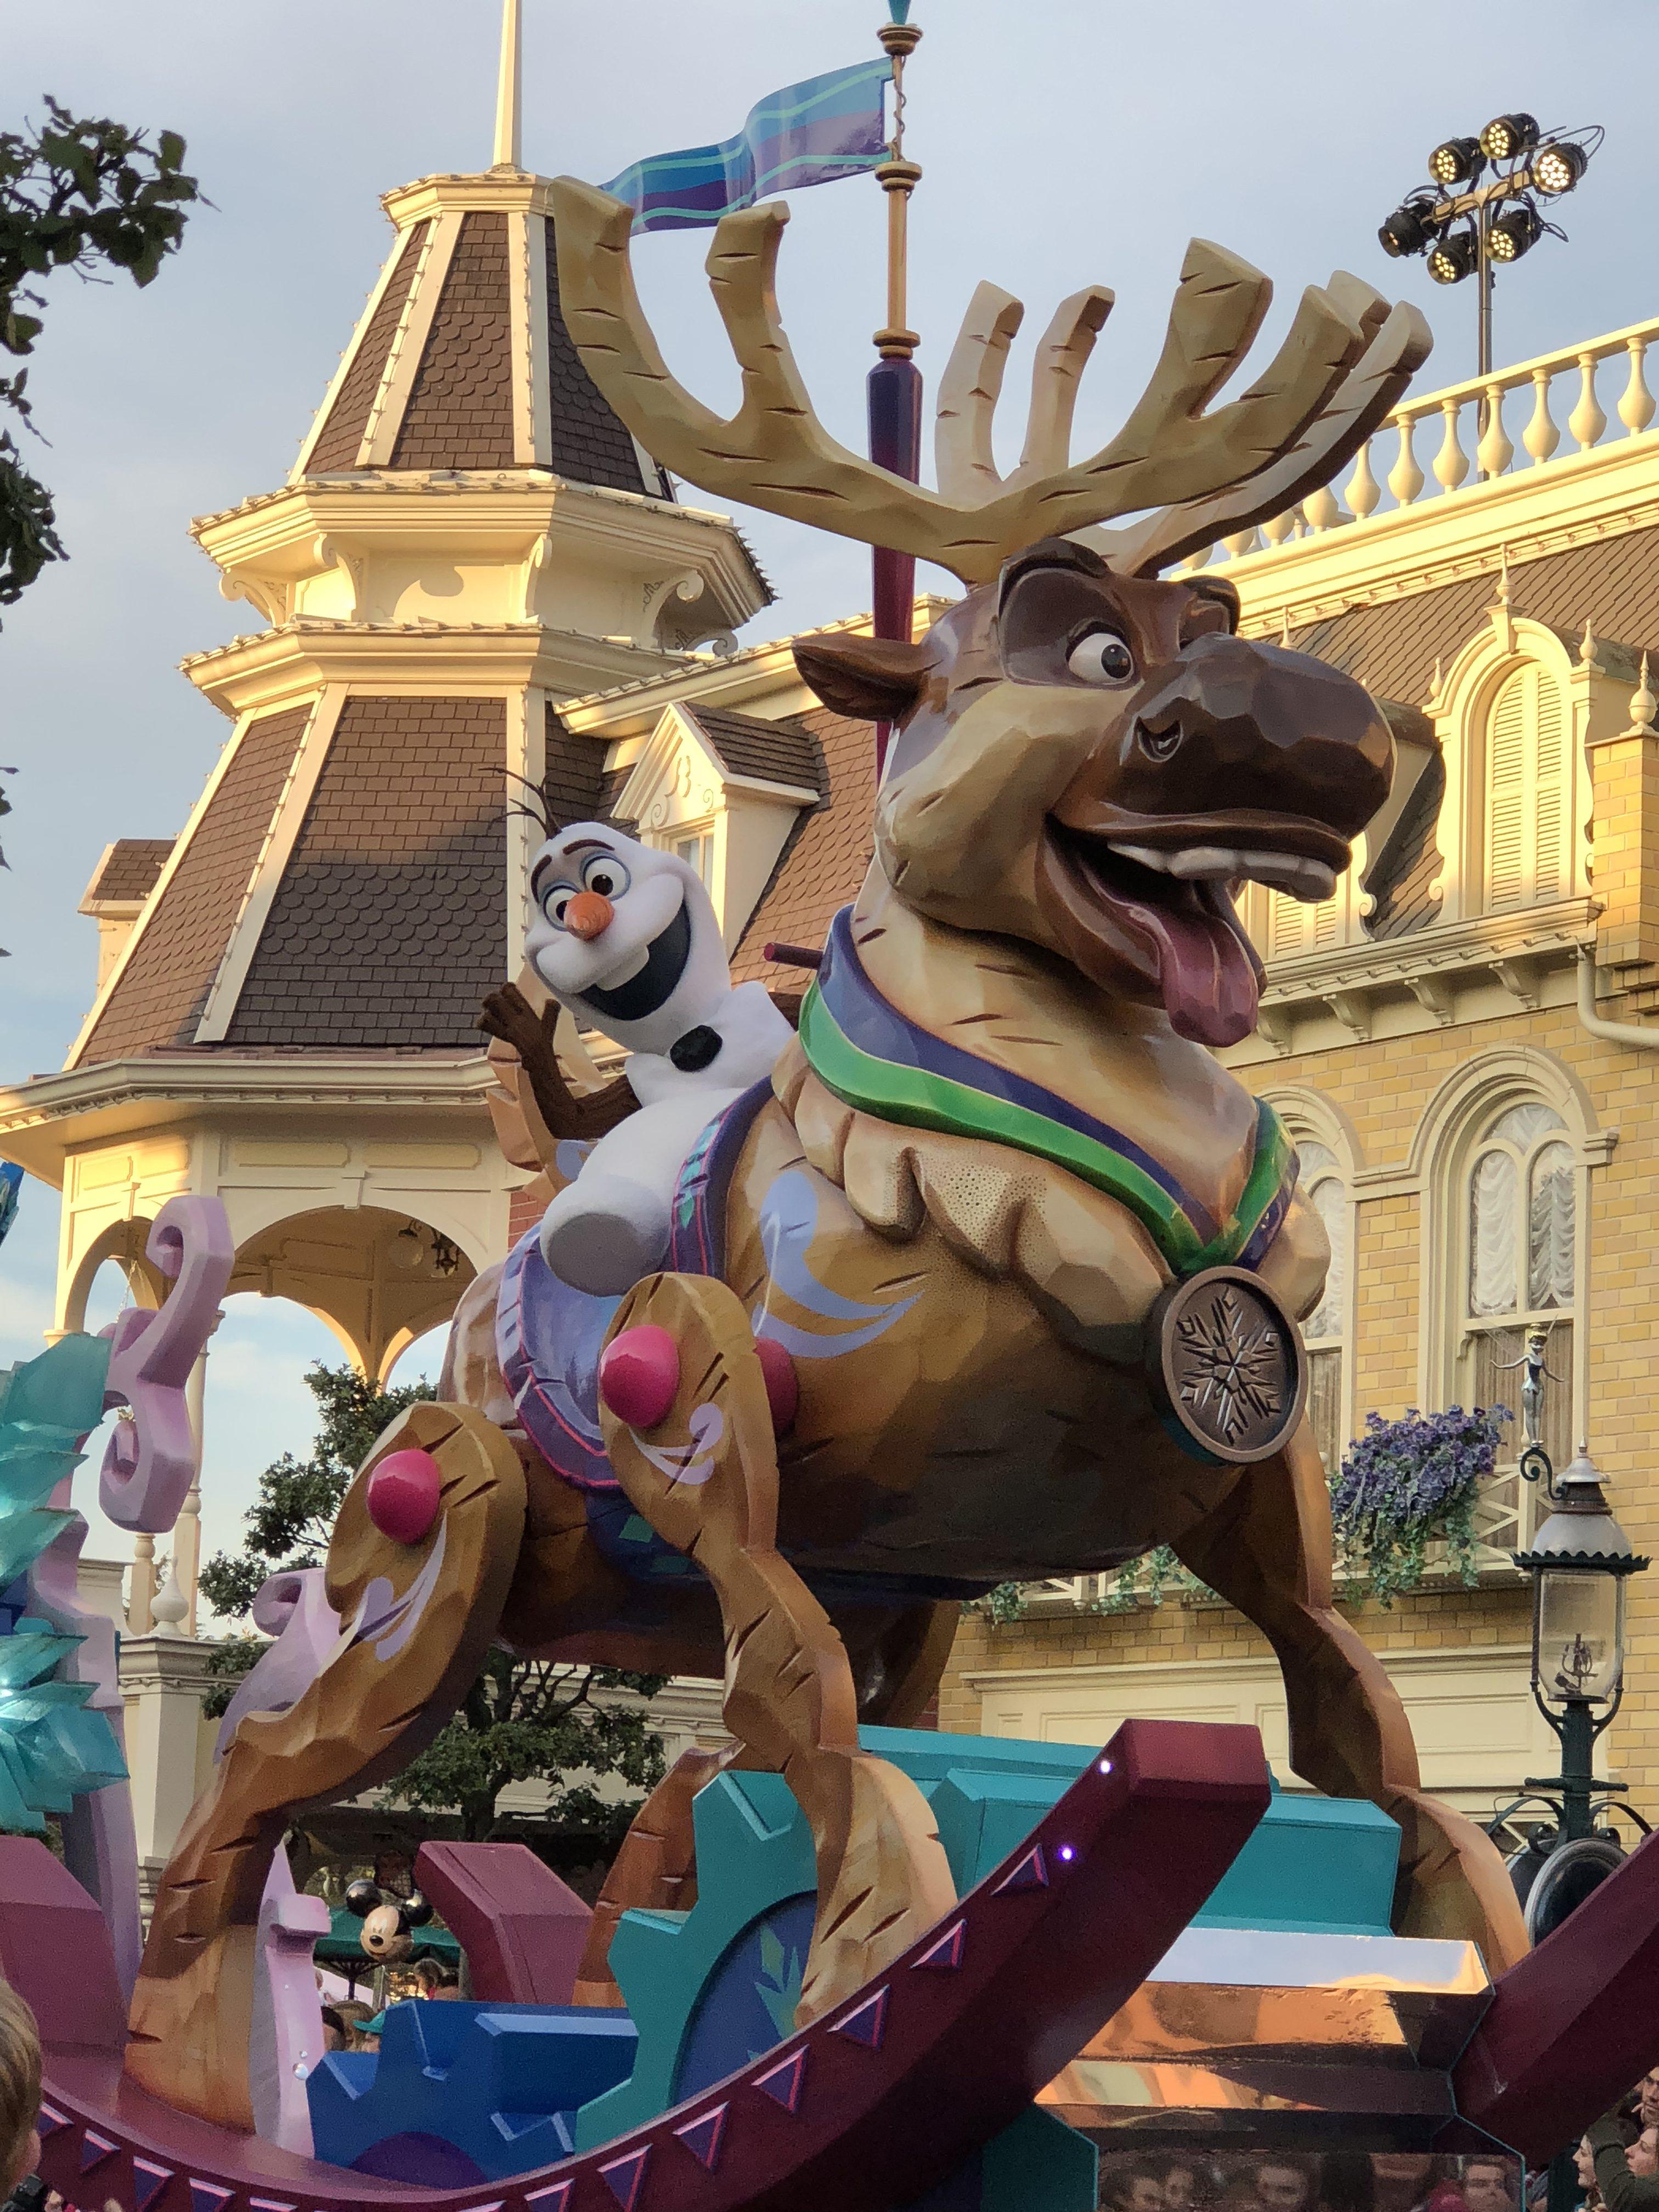 Disneyland: Disney Parade Frozen